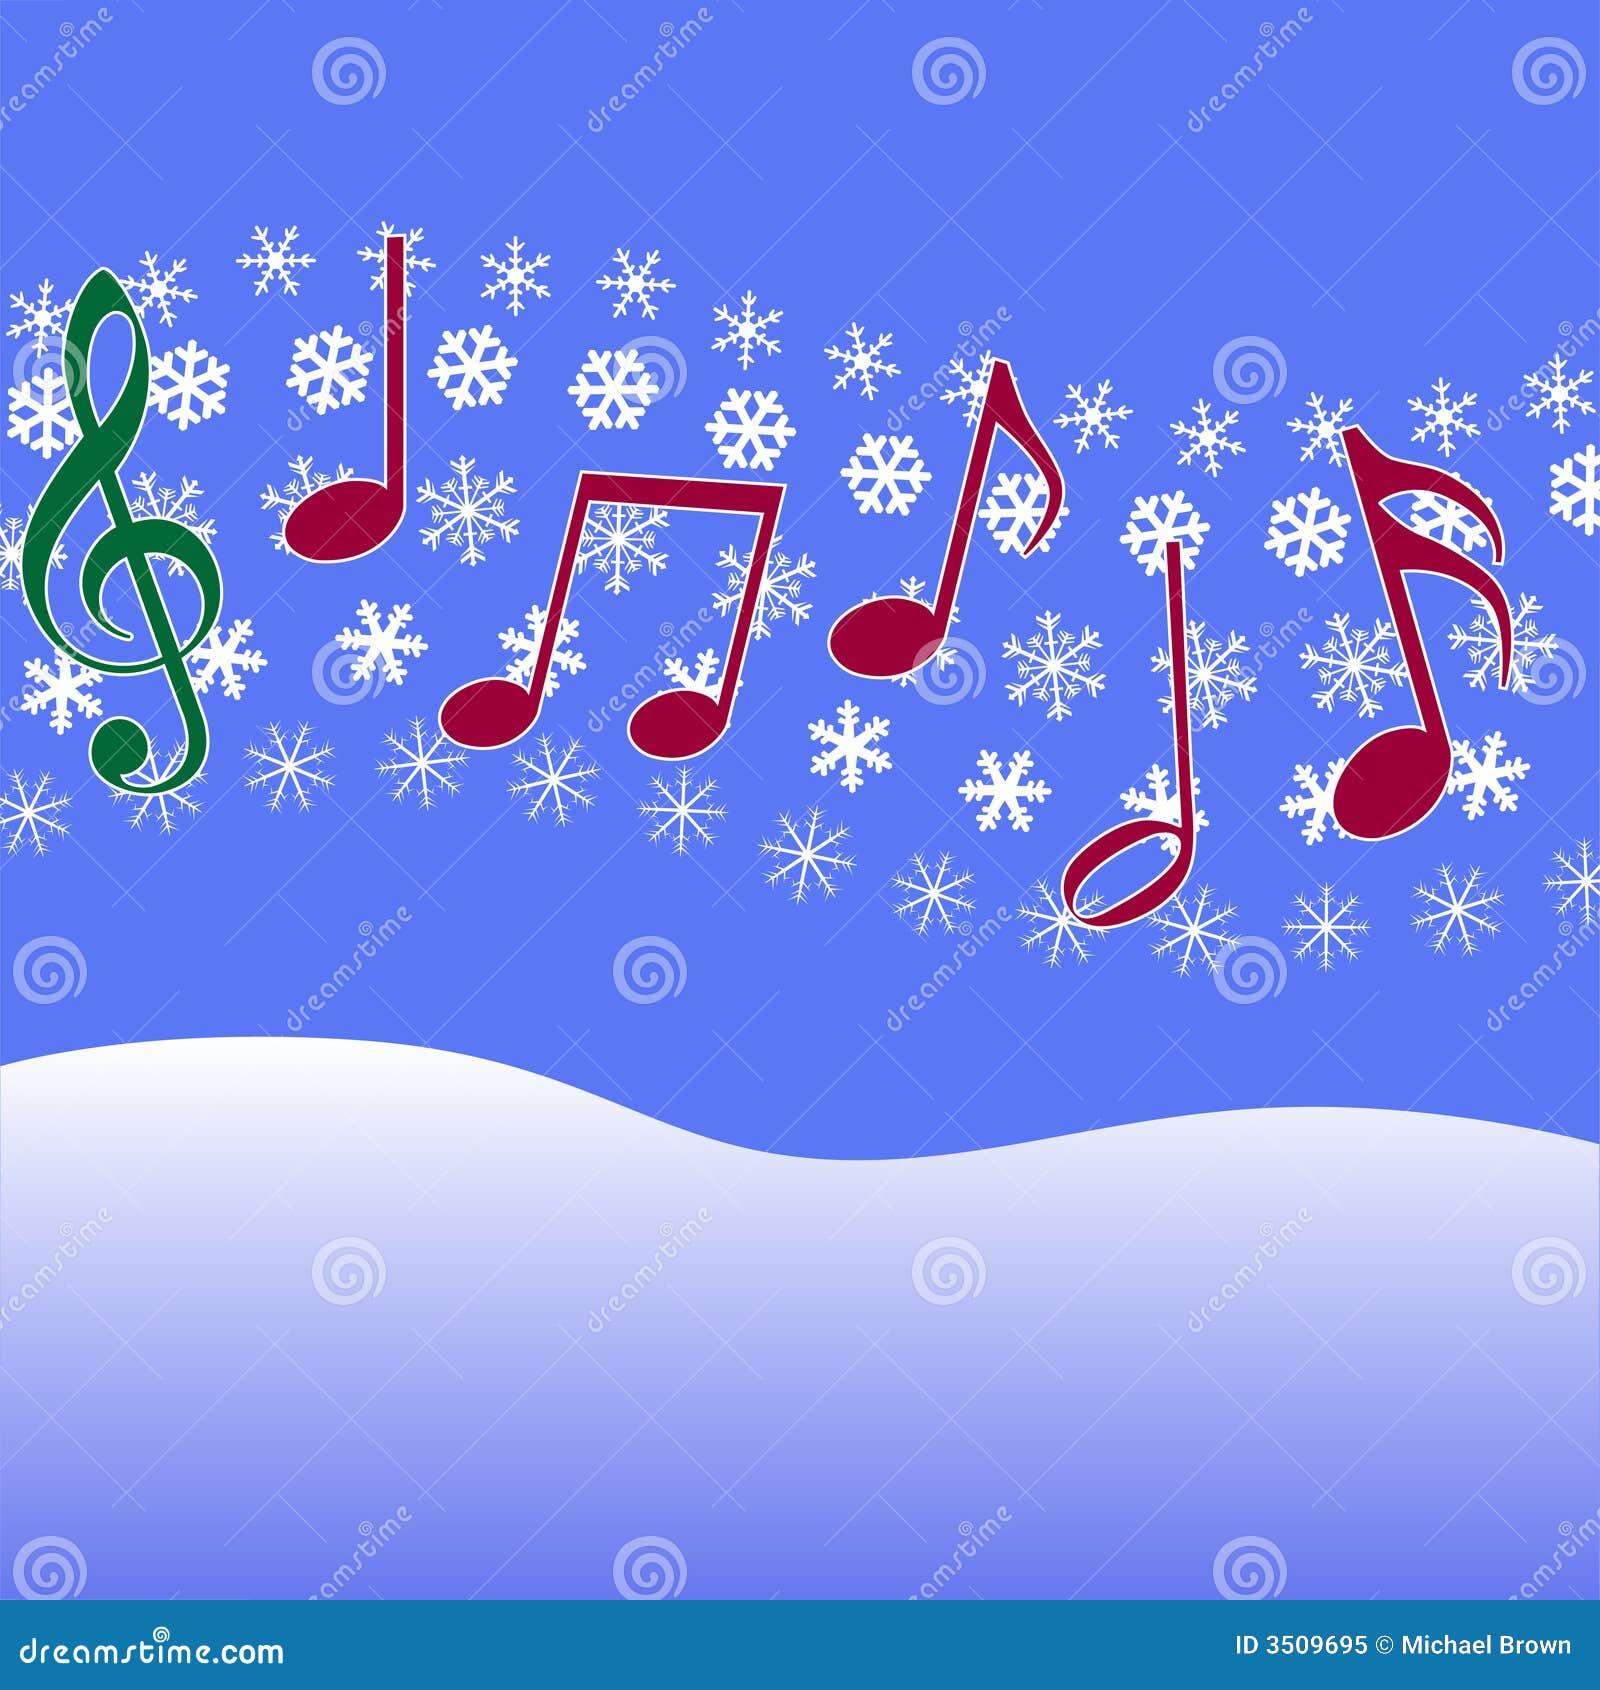 Christmas carol music snow stock vector illustration of symbols christmas carol music snow voltagebd Images